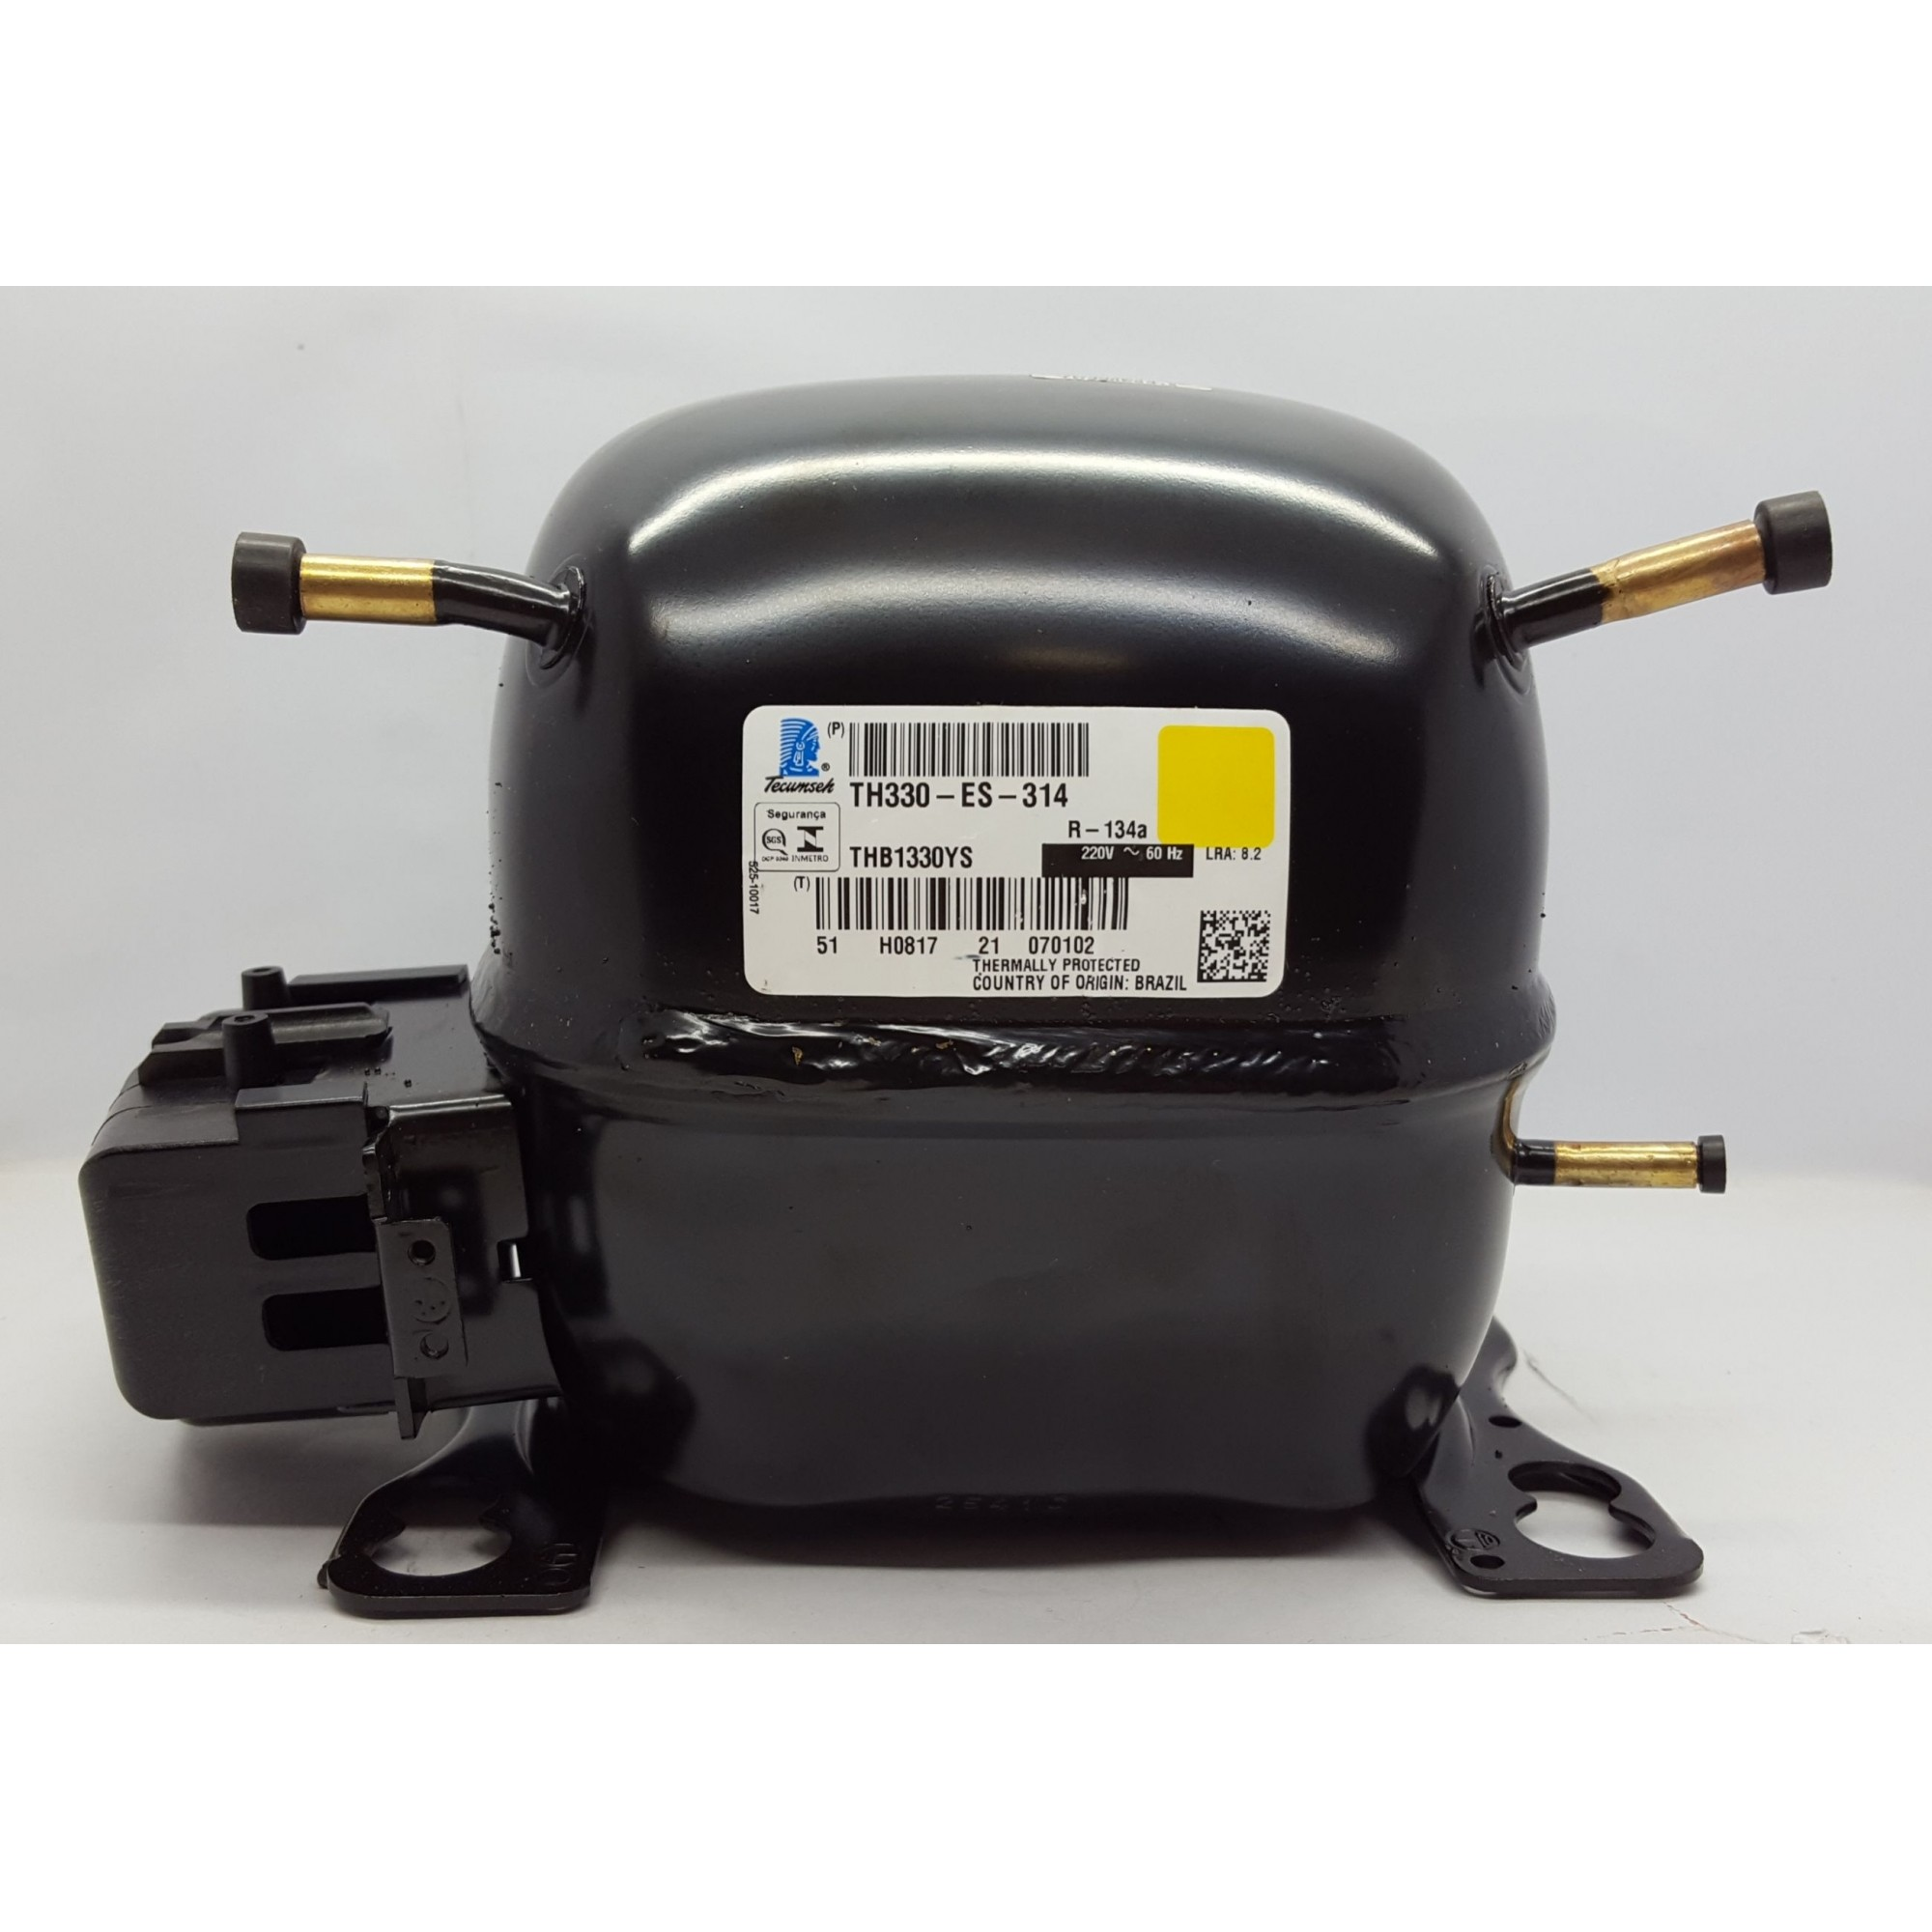 MOTOR COMPRESSOR TECUMSEH 1/10 HP - THB1330YS - R-134a (220v)